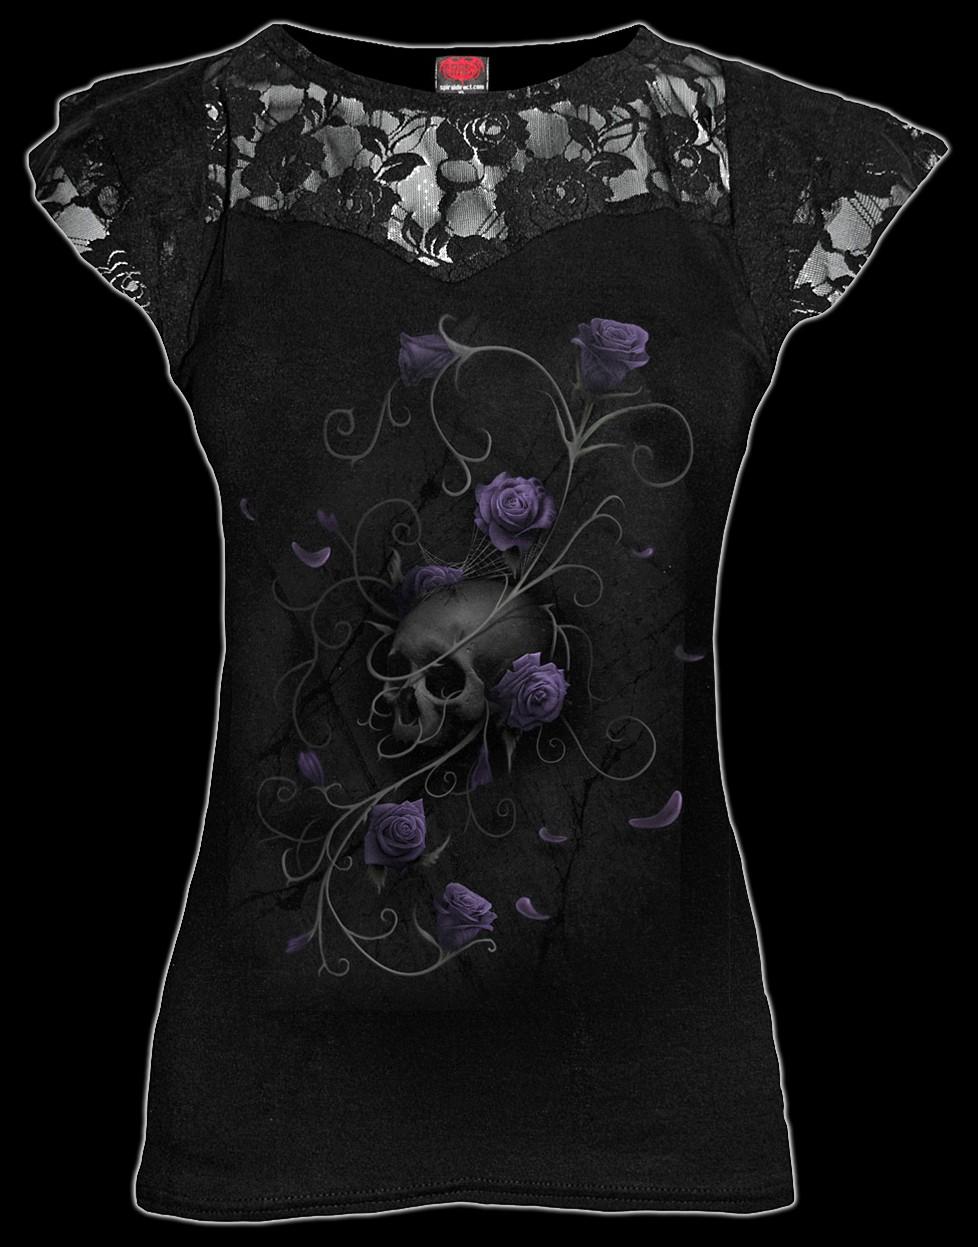 Entwined Skull - Gothic Rose - Women Lace Shirt